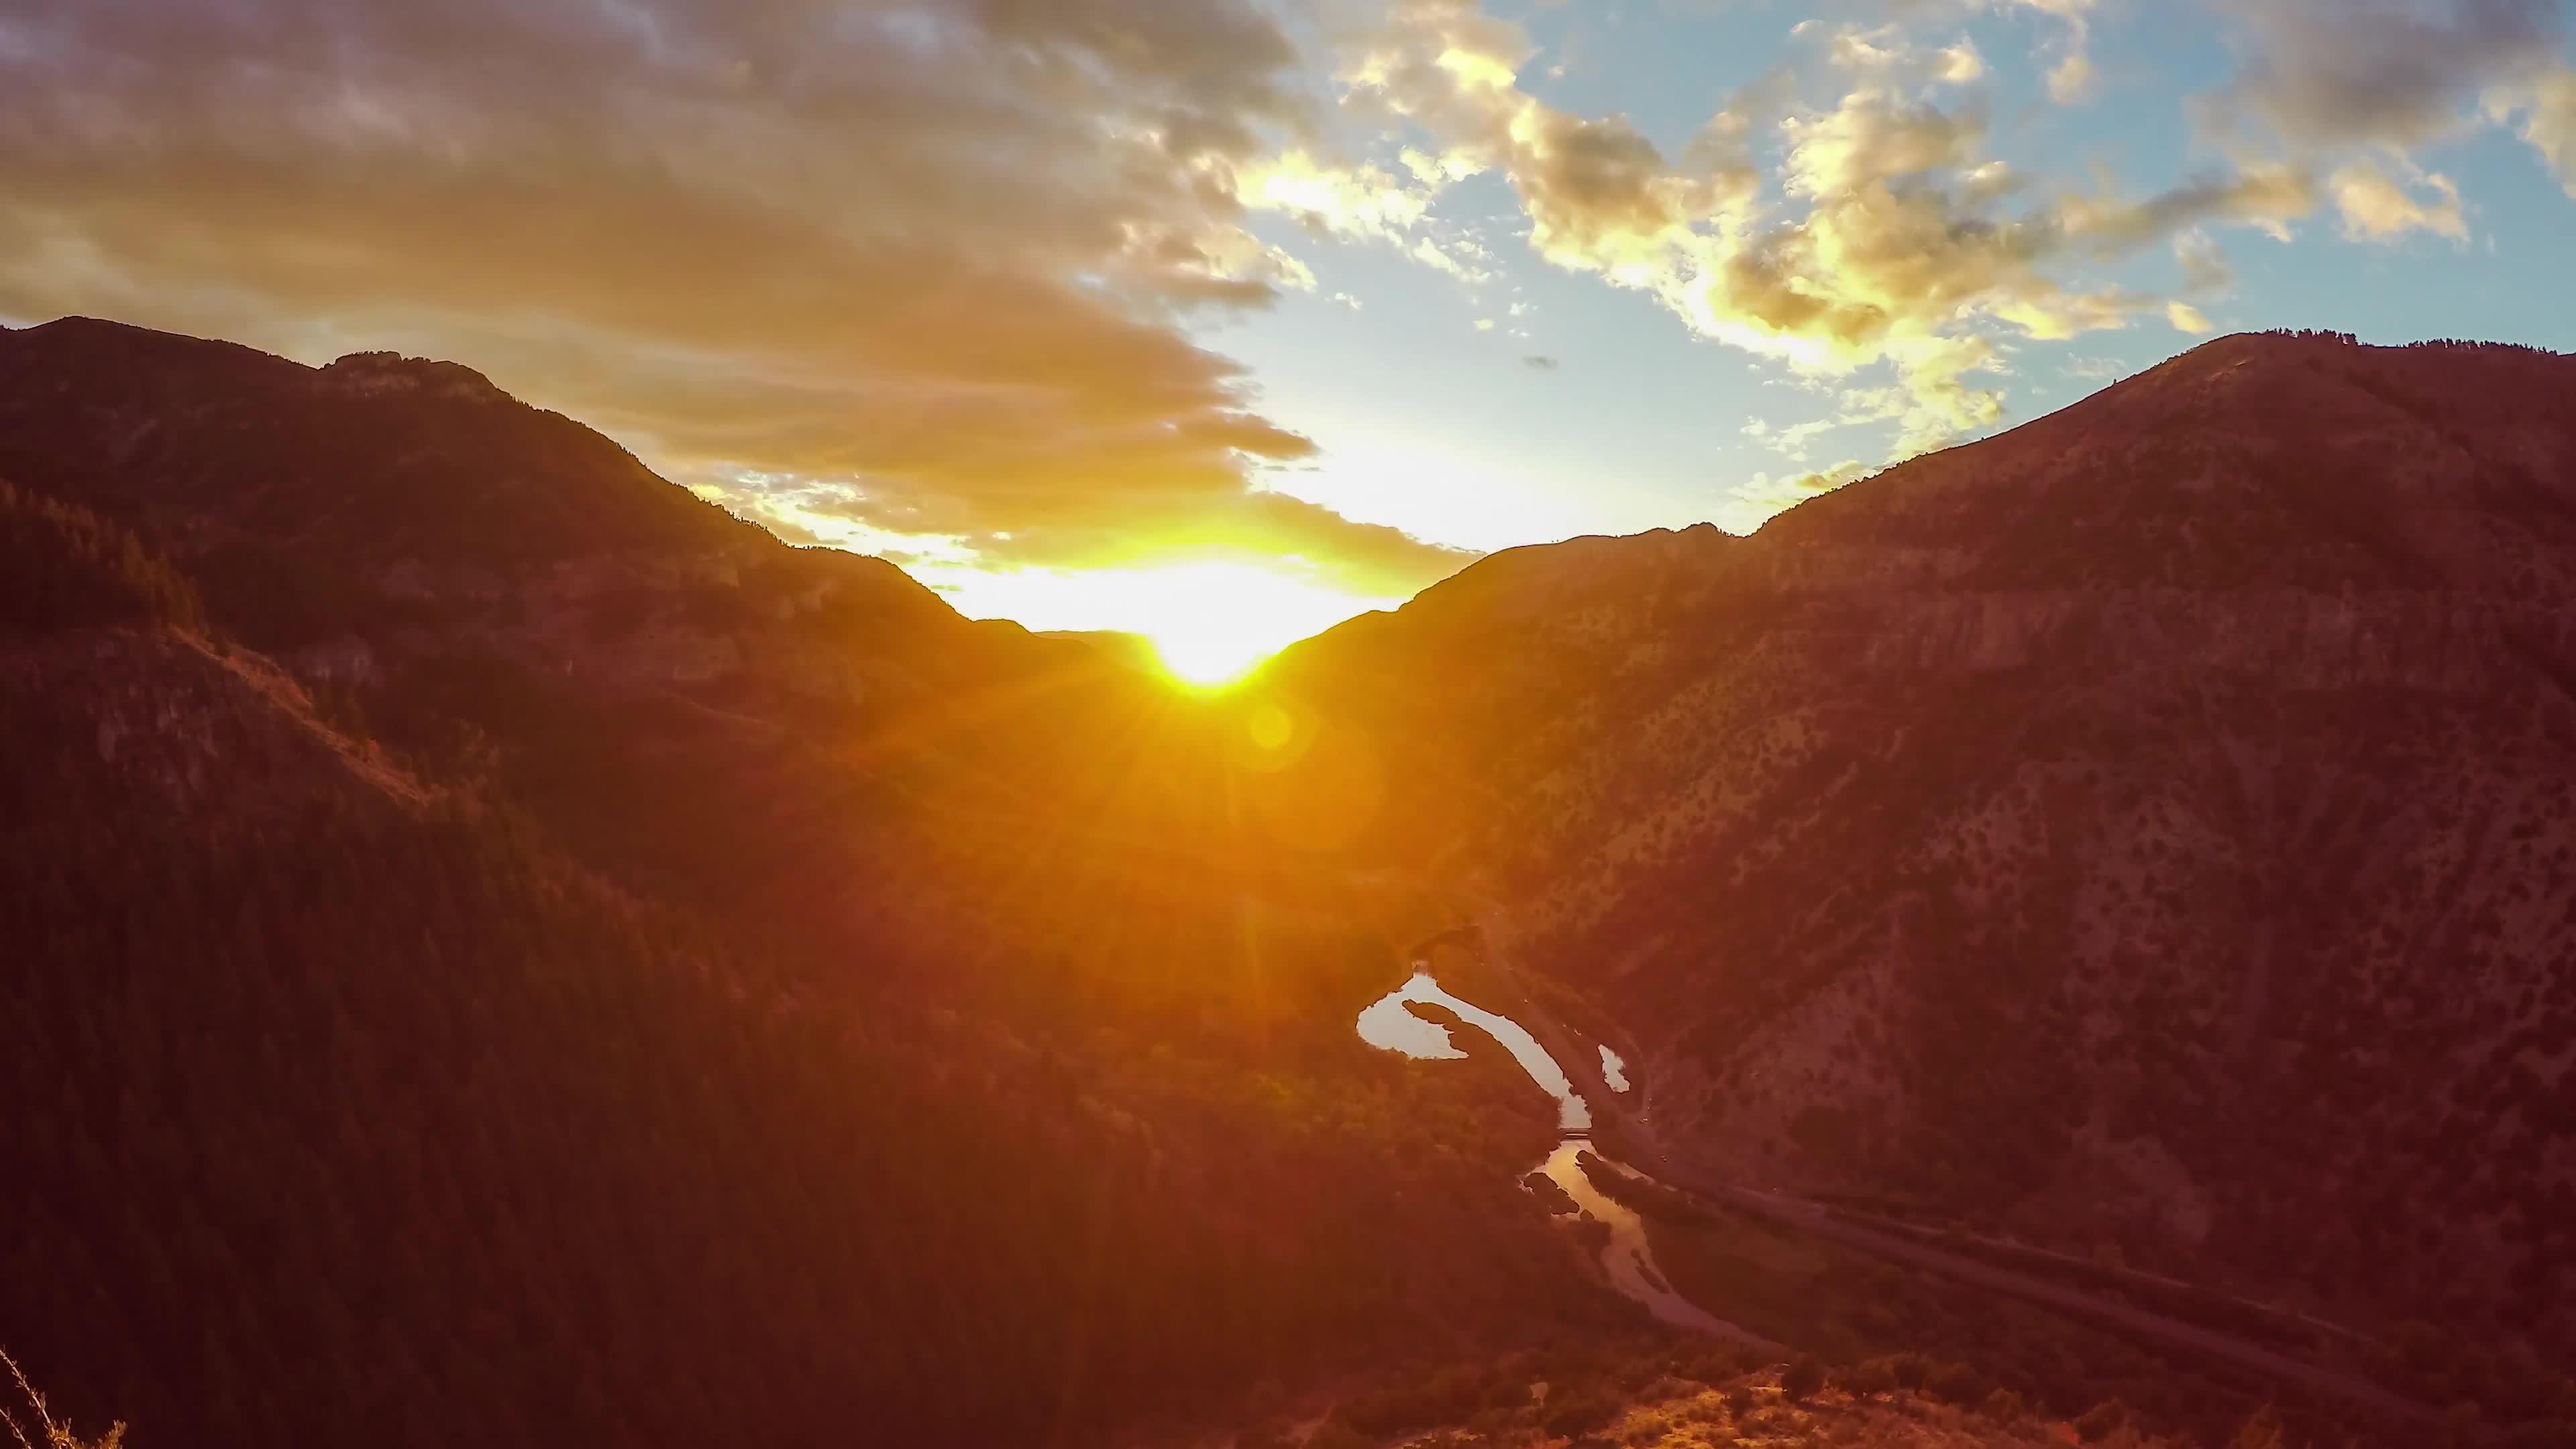 earthgifs, gopro, gopro hero 4, GoPro HERO4: Amazing Sunset Time Lapse 4K UHD GIFs